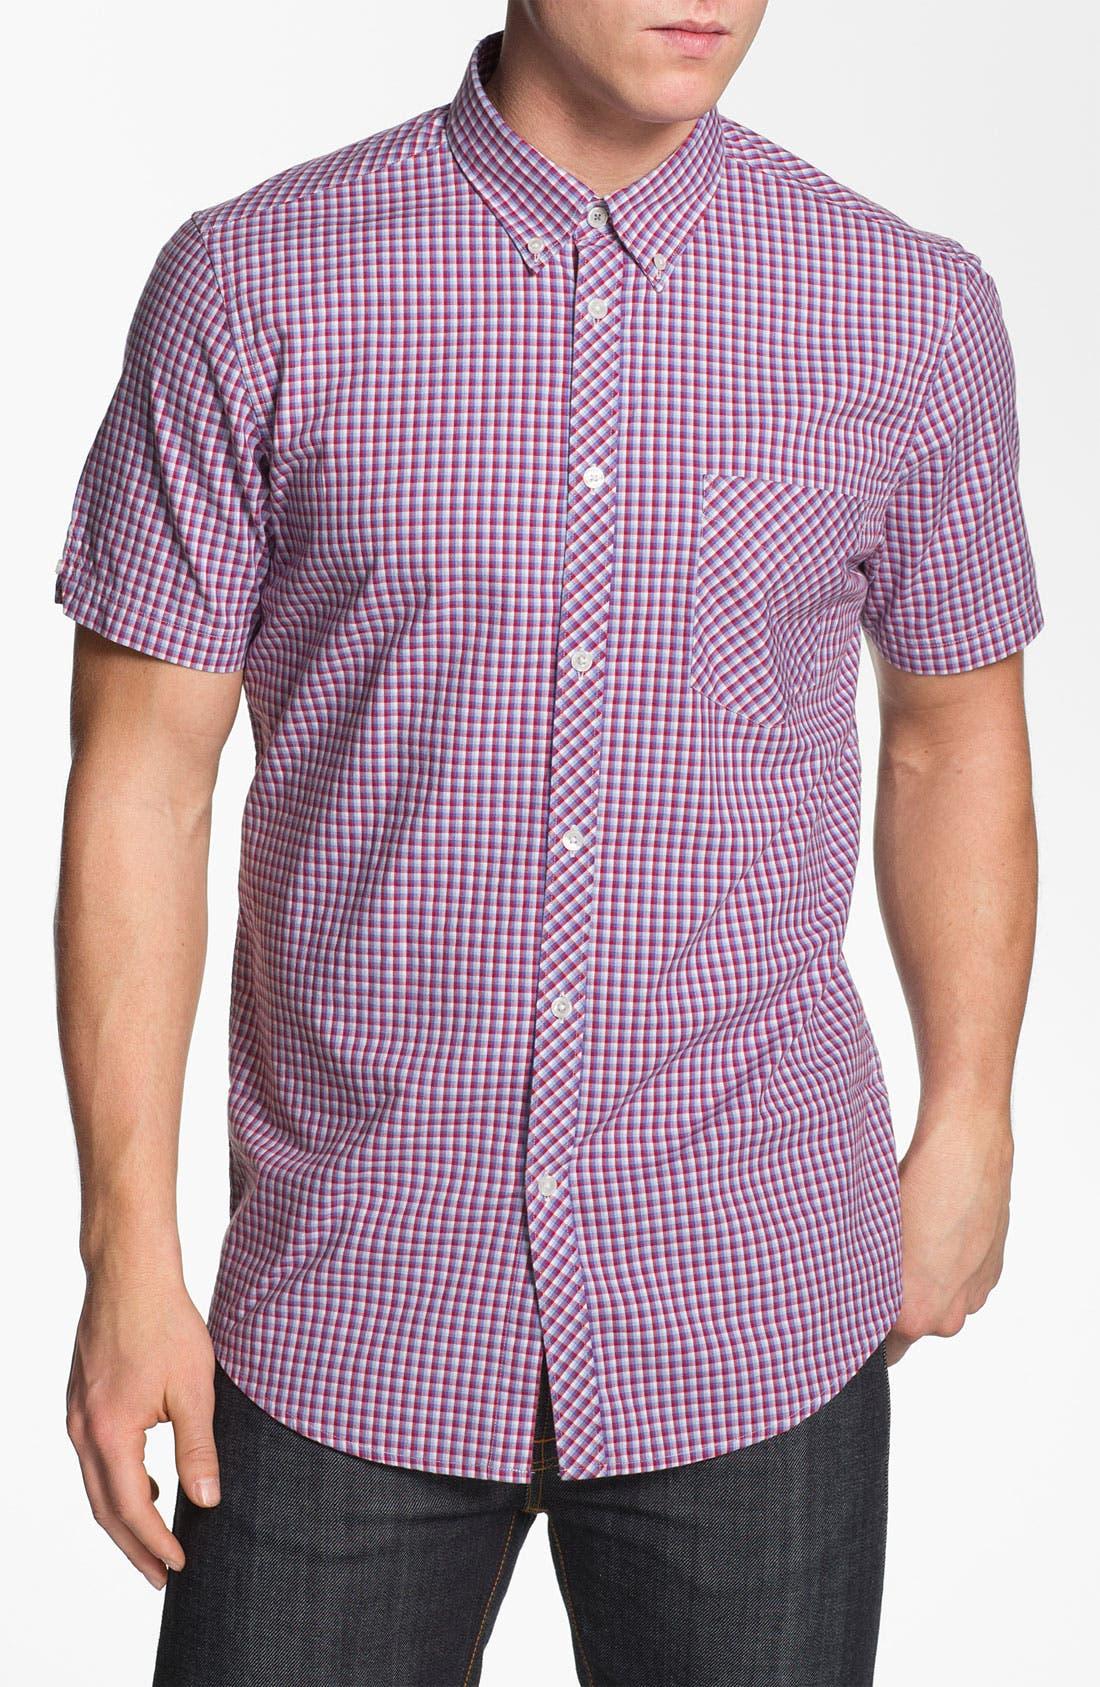 Main Image - Ben Sherman Short Sleeve Woven Shirt